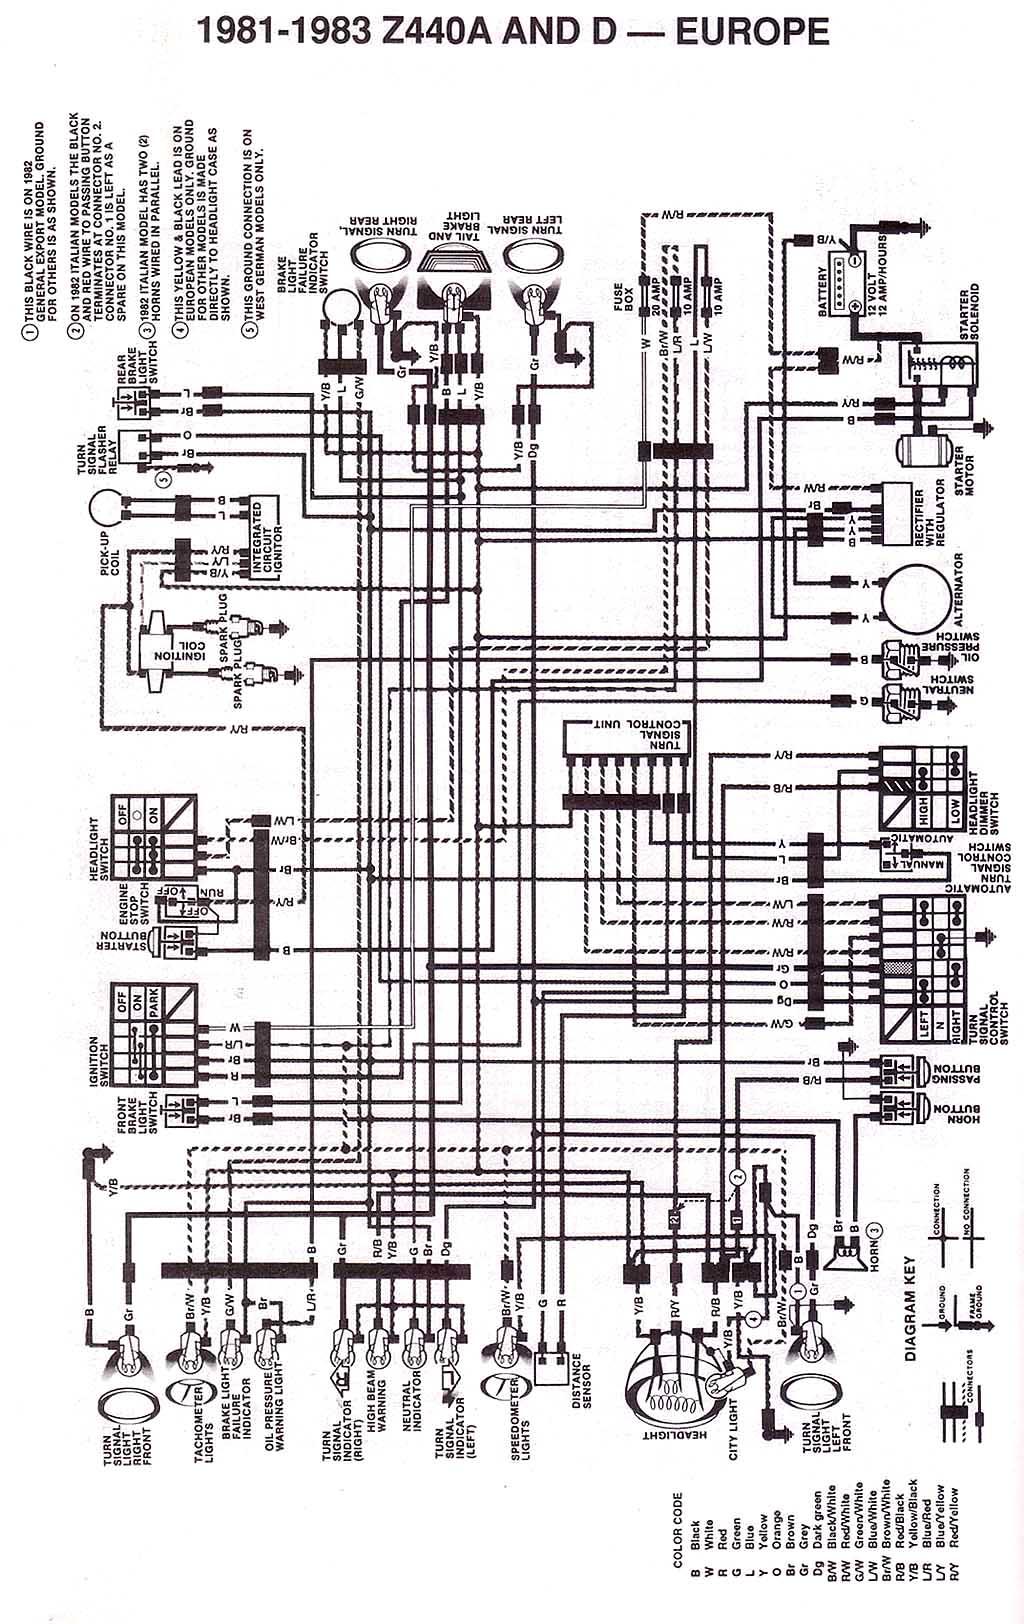 Kawasaki Zg1000 Wiring Diagram Auto Electrical 1983 Subaru